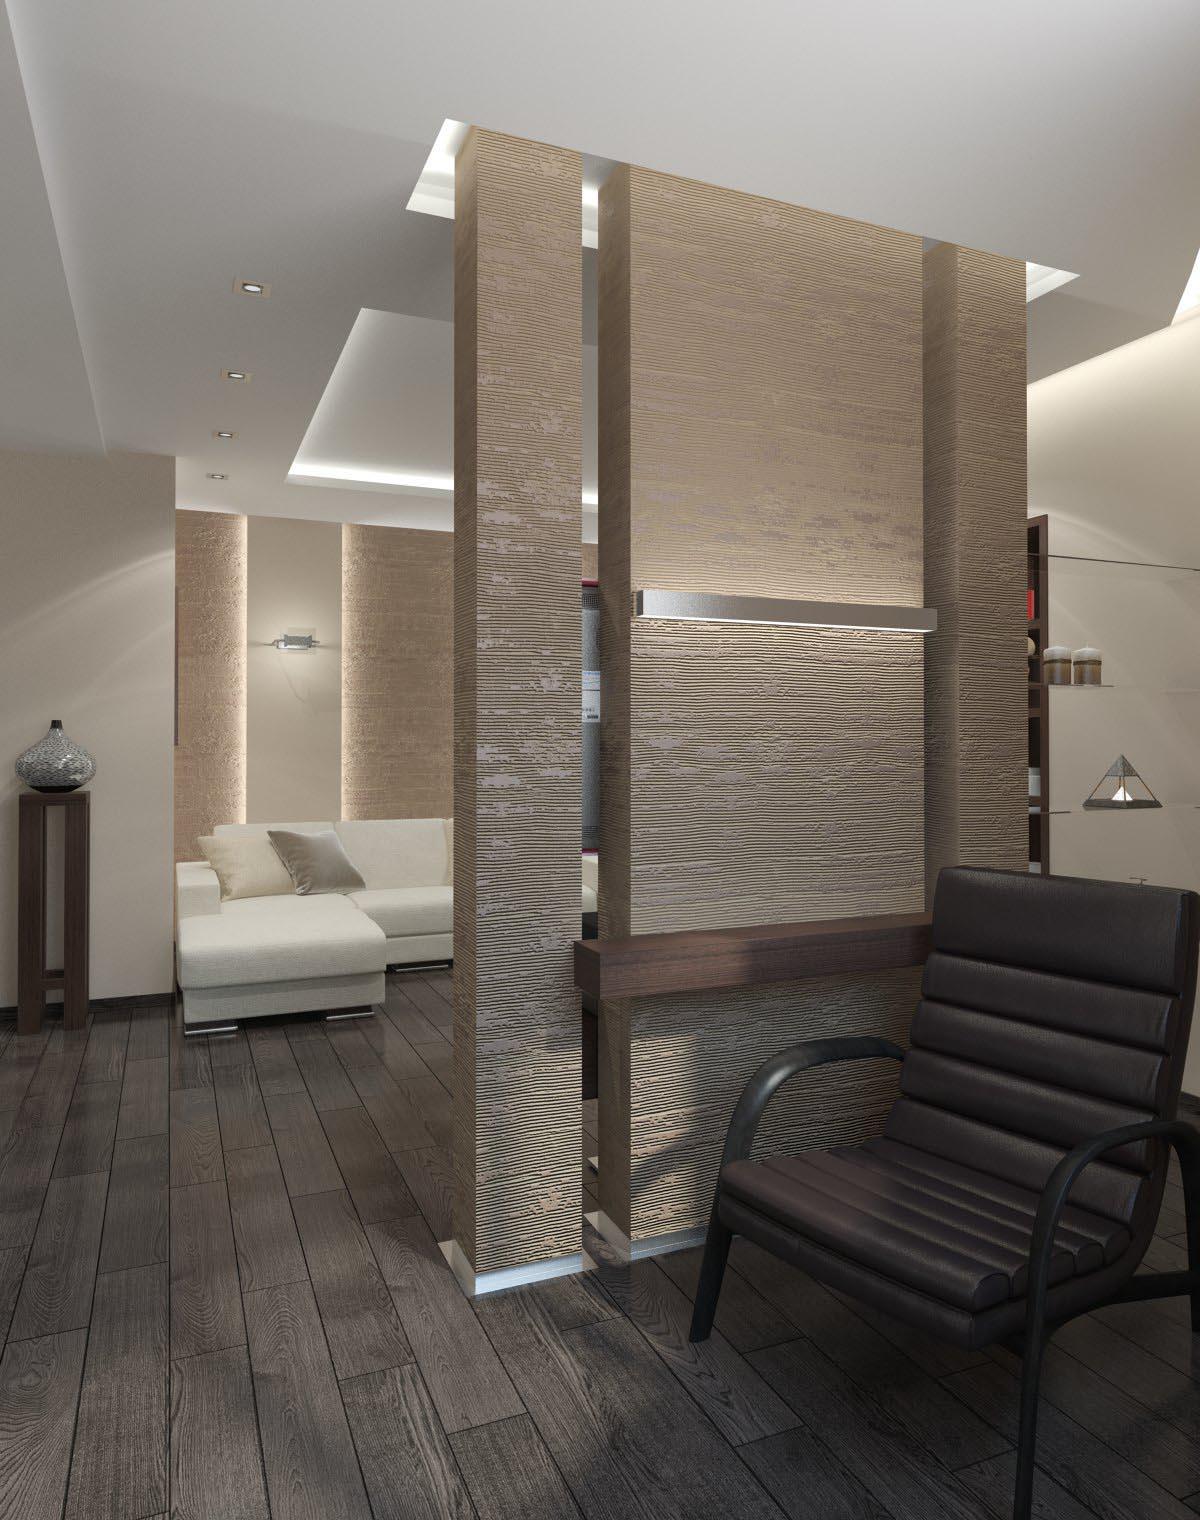 Однокомнатная квартира 47 м²